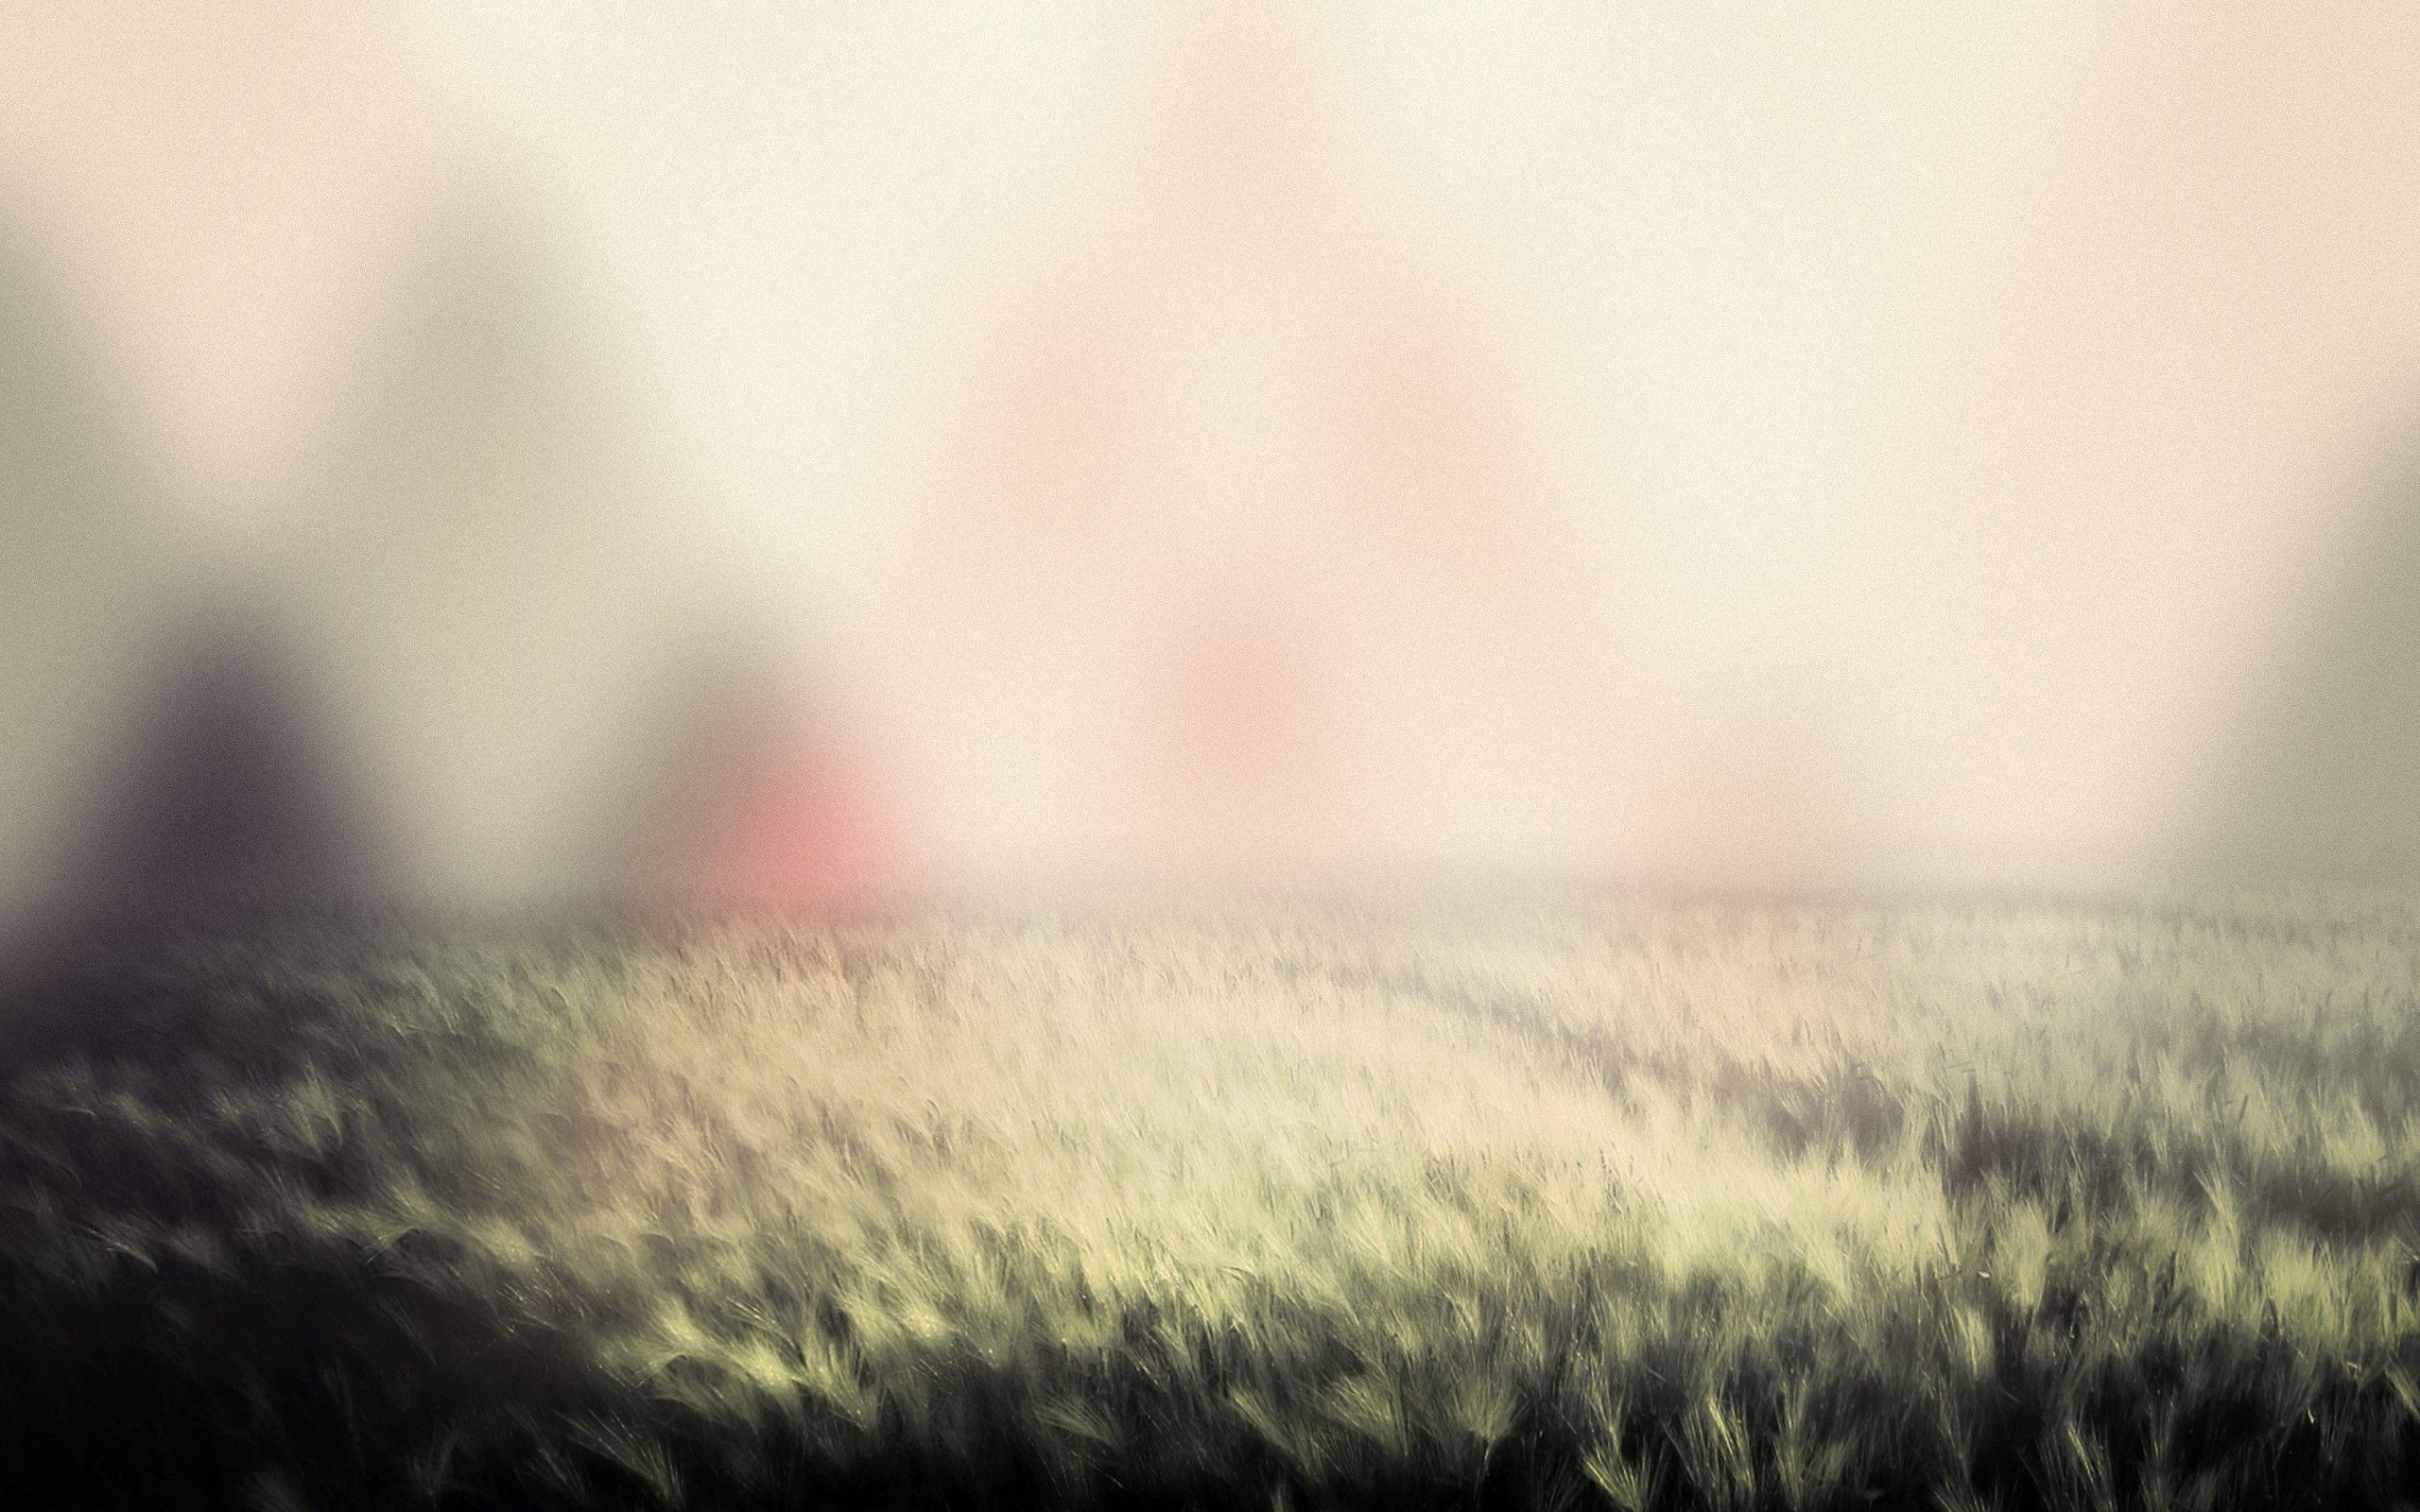 Best Wallpaper Mountain Blurry - 7b0b0a7e8d71b2fbe29c48e540248bda  Image_906410.jpg